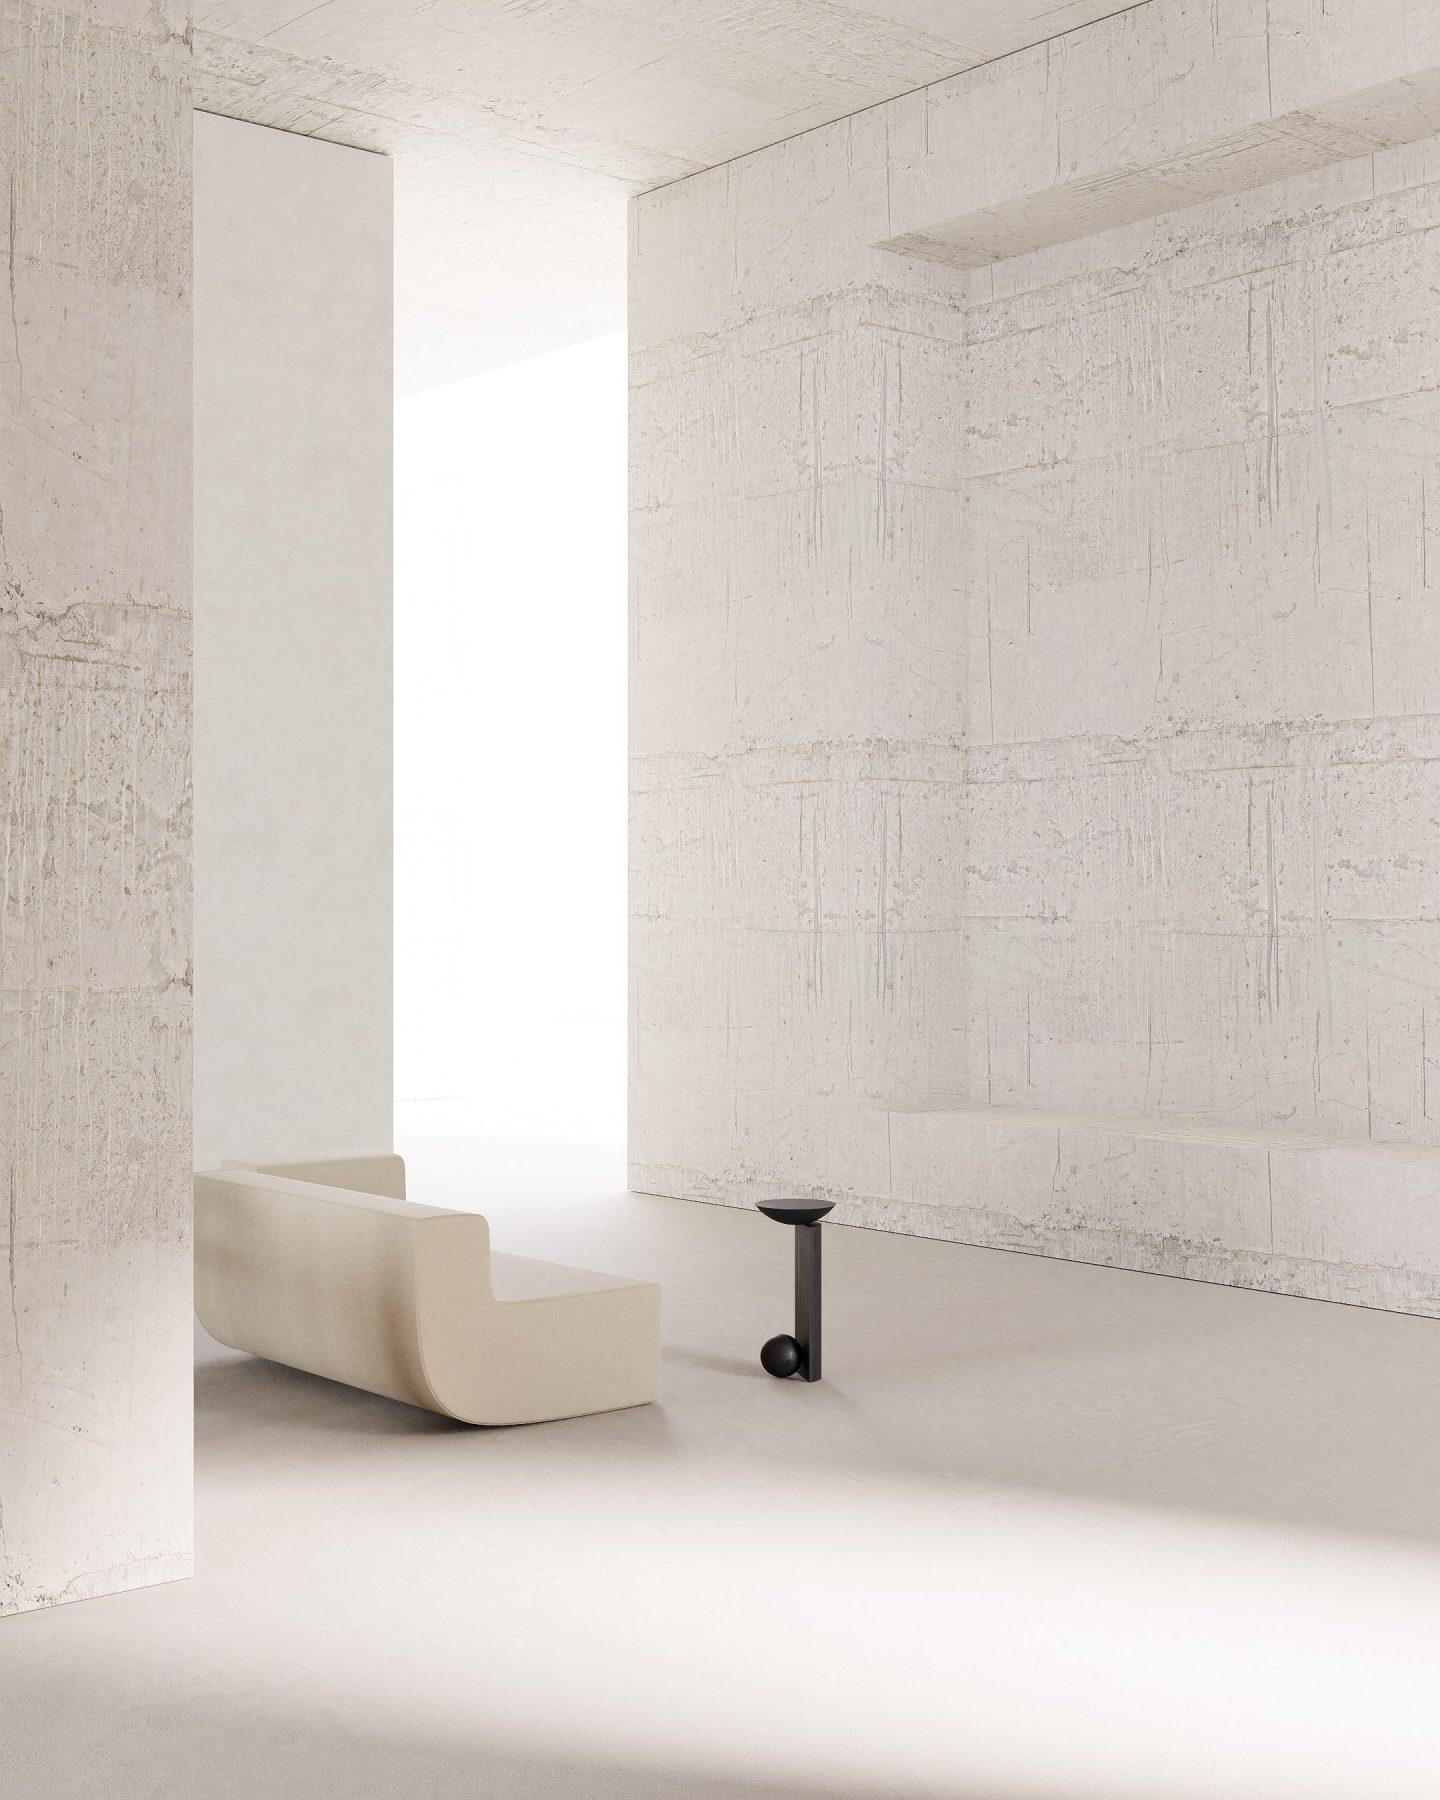 IGNANT-Design-Interview-Osminina-25